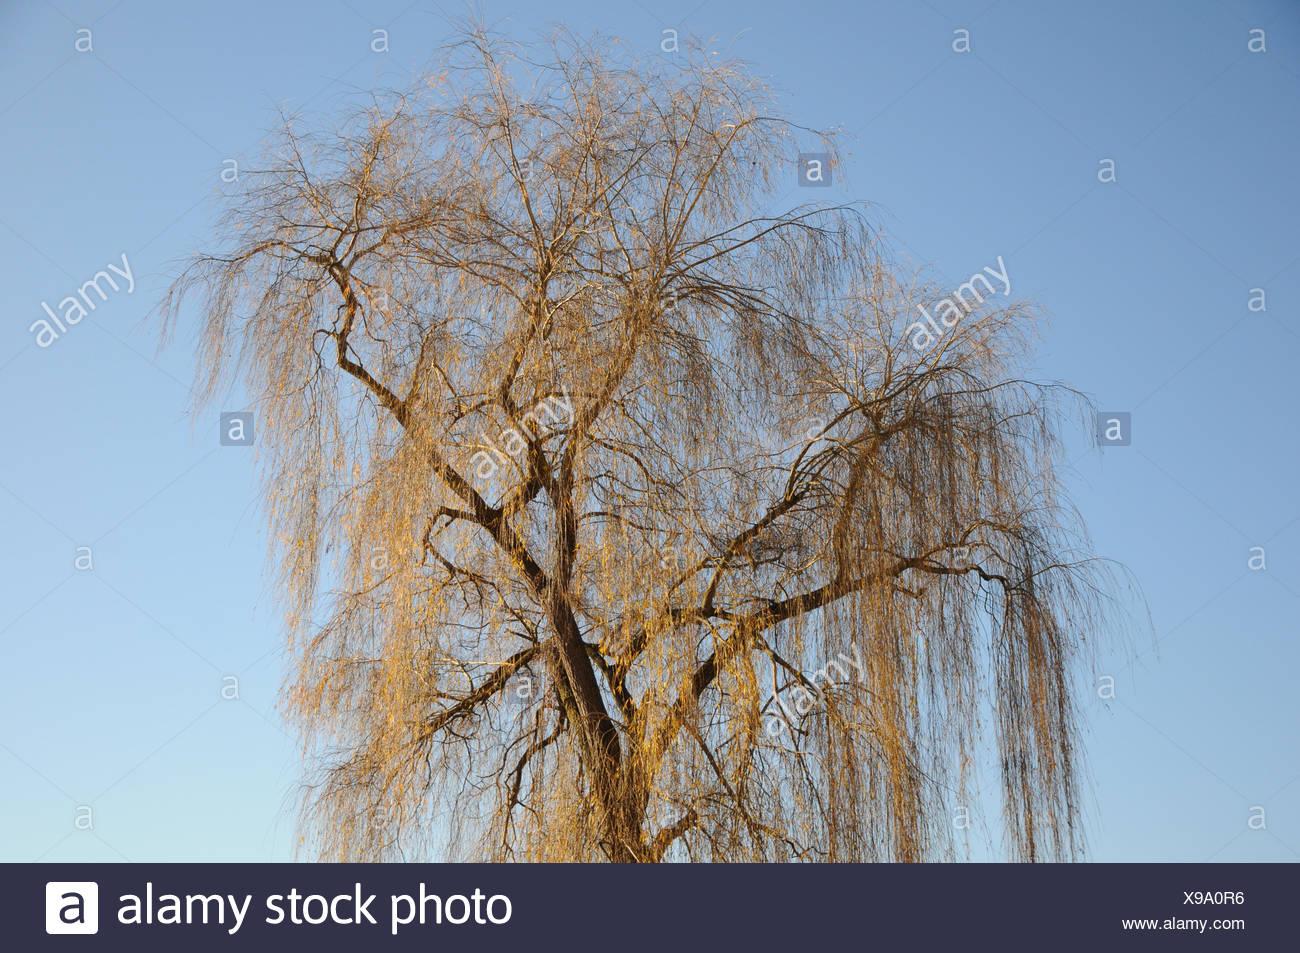 Salix alba Tristis, Weeping willow - Stock Image